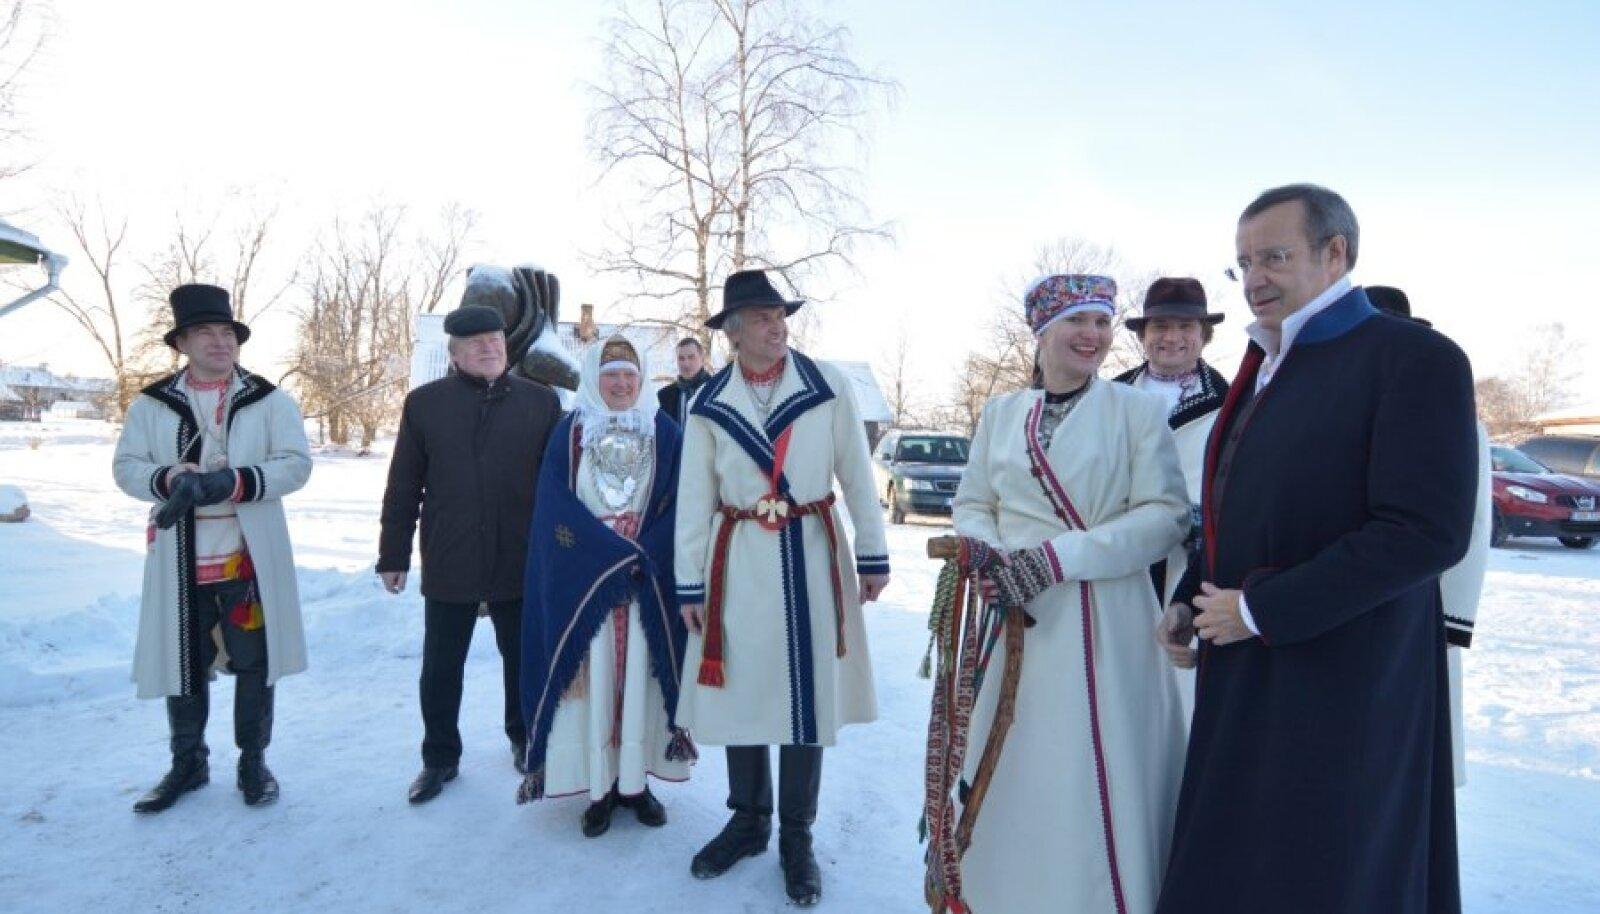 Avatseremoonial osales ka president Toomas Hendrik Ilves.